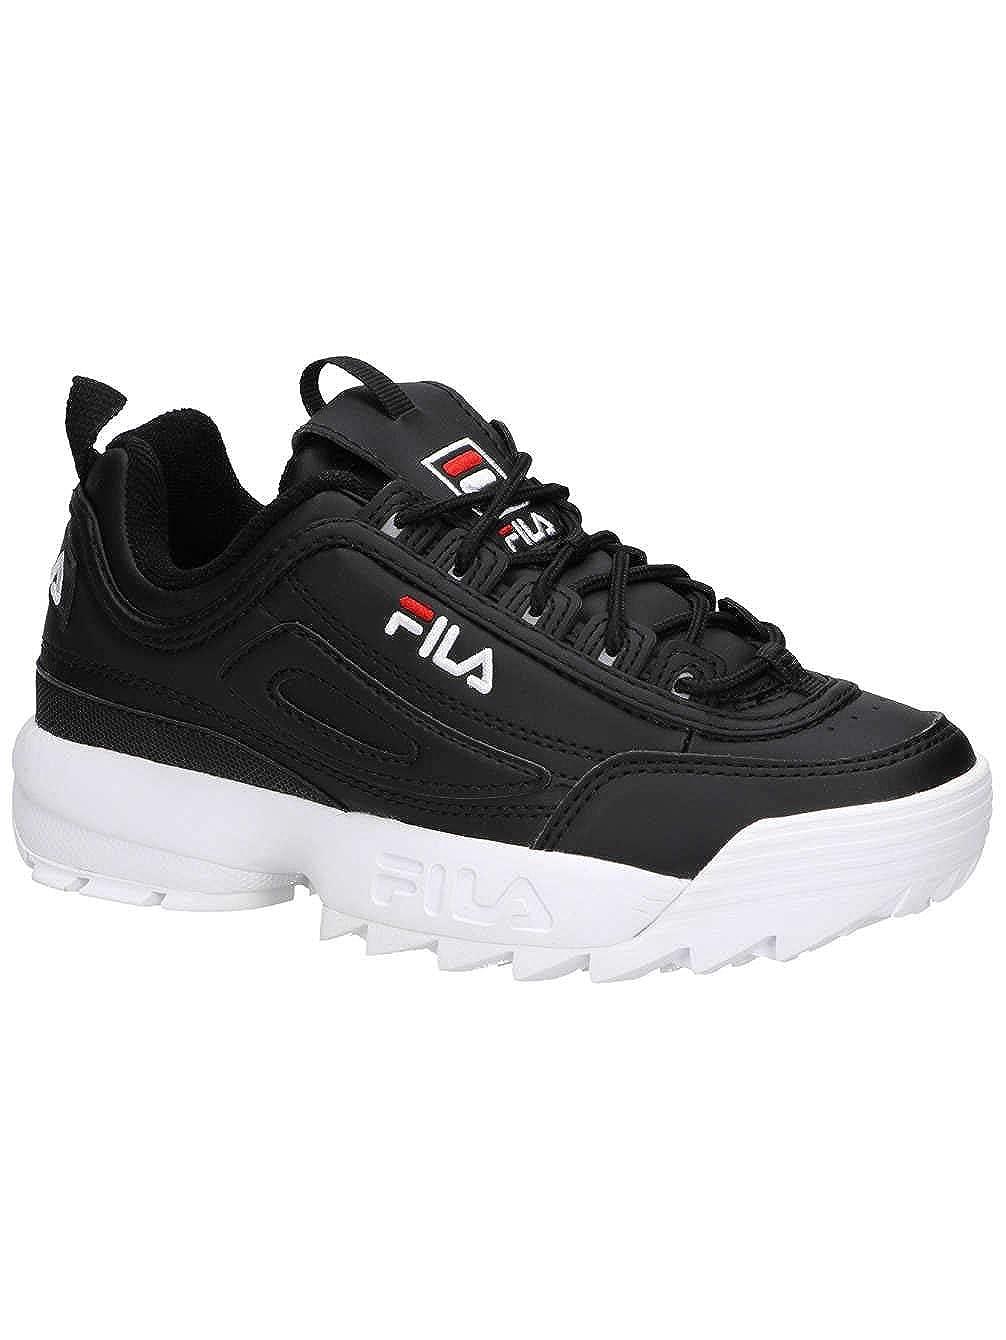 Fila Disruptor Low Wn's 101030225Y, Basket